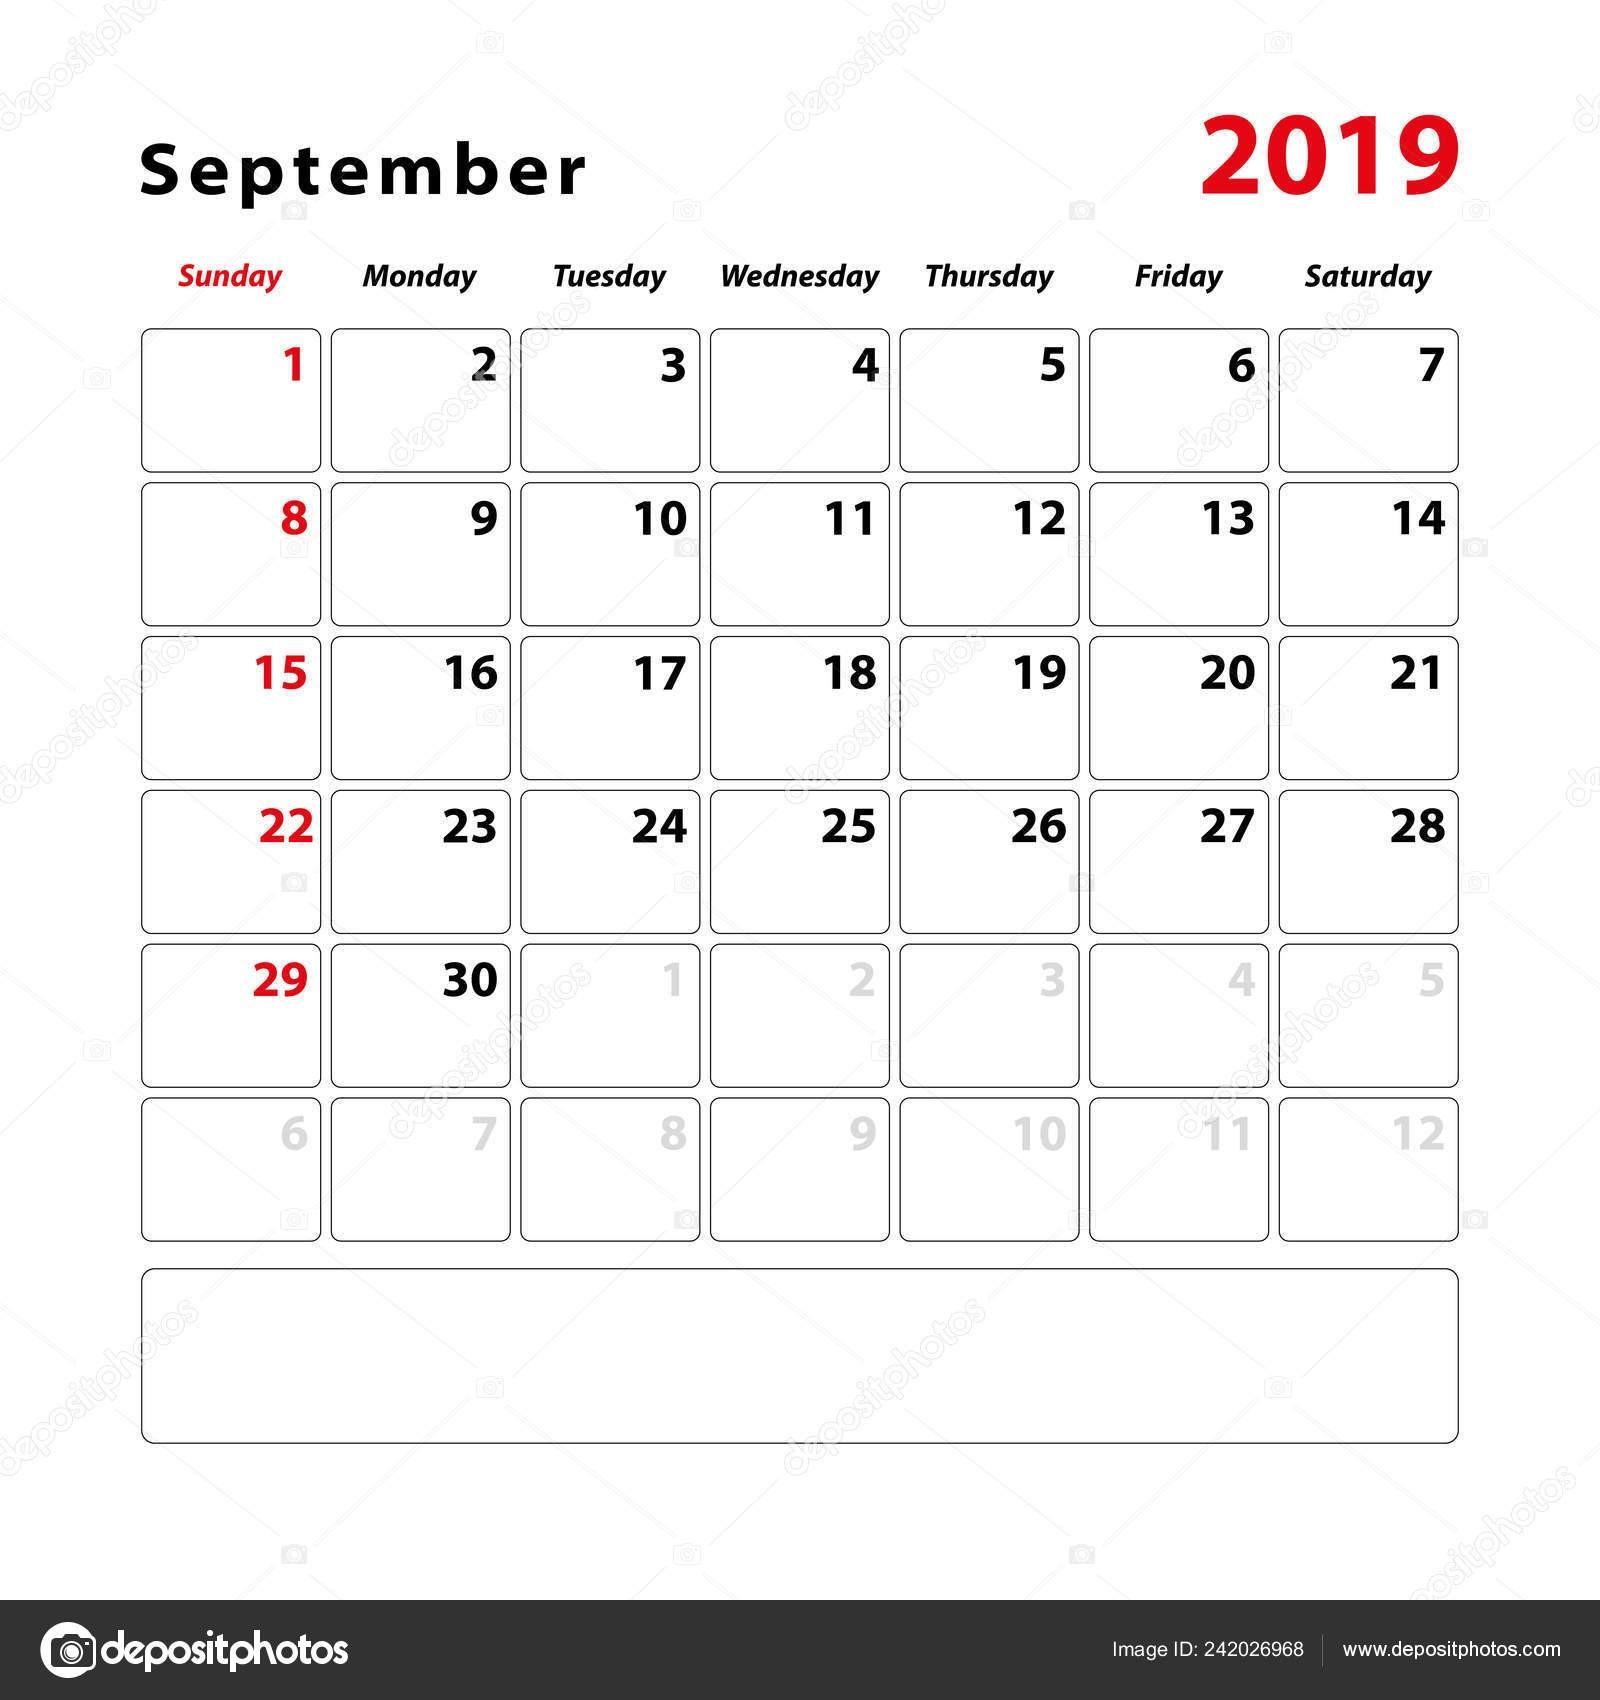 depositphotos stock illustration calendar sheet month september 2019